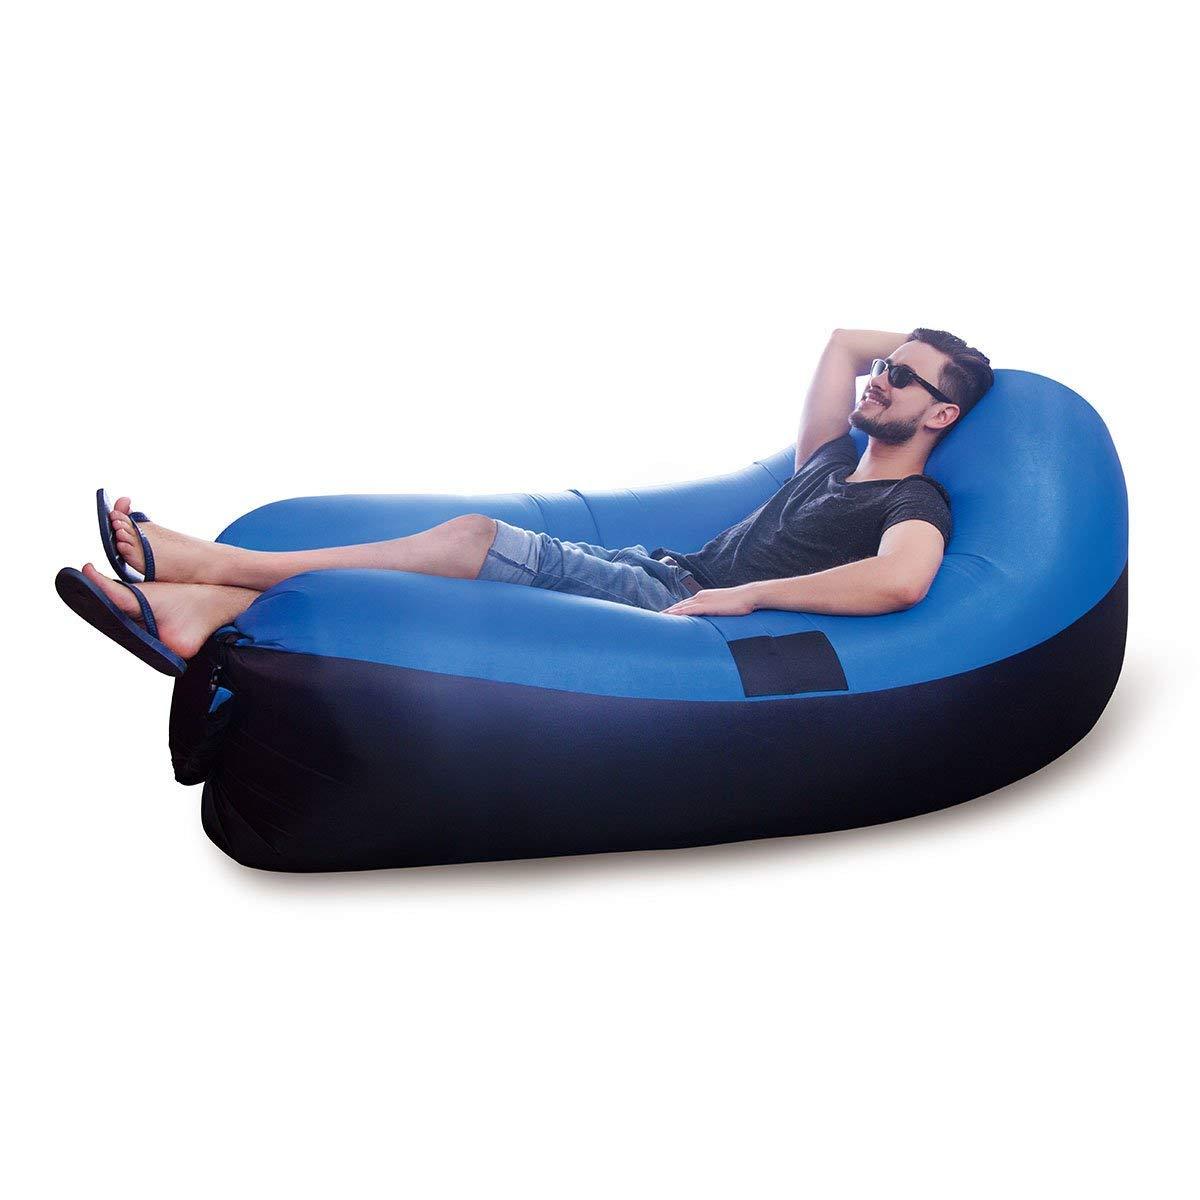 JML Air Chair Outdoor Garden Beach Inflatable Blow-Up Sofa & Air Bed Blue